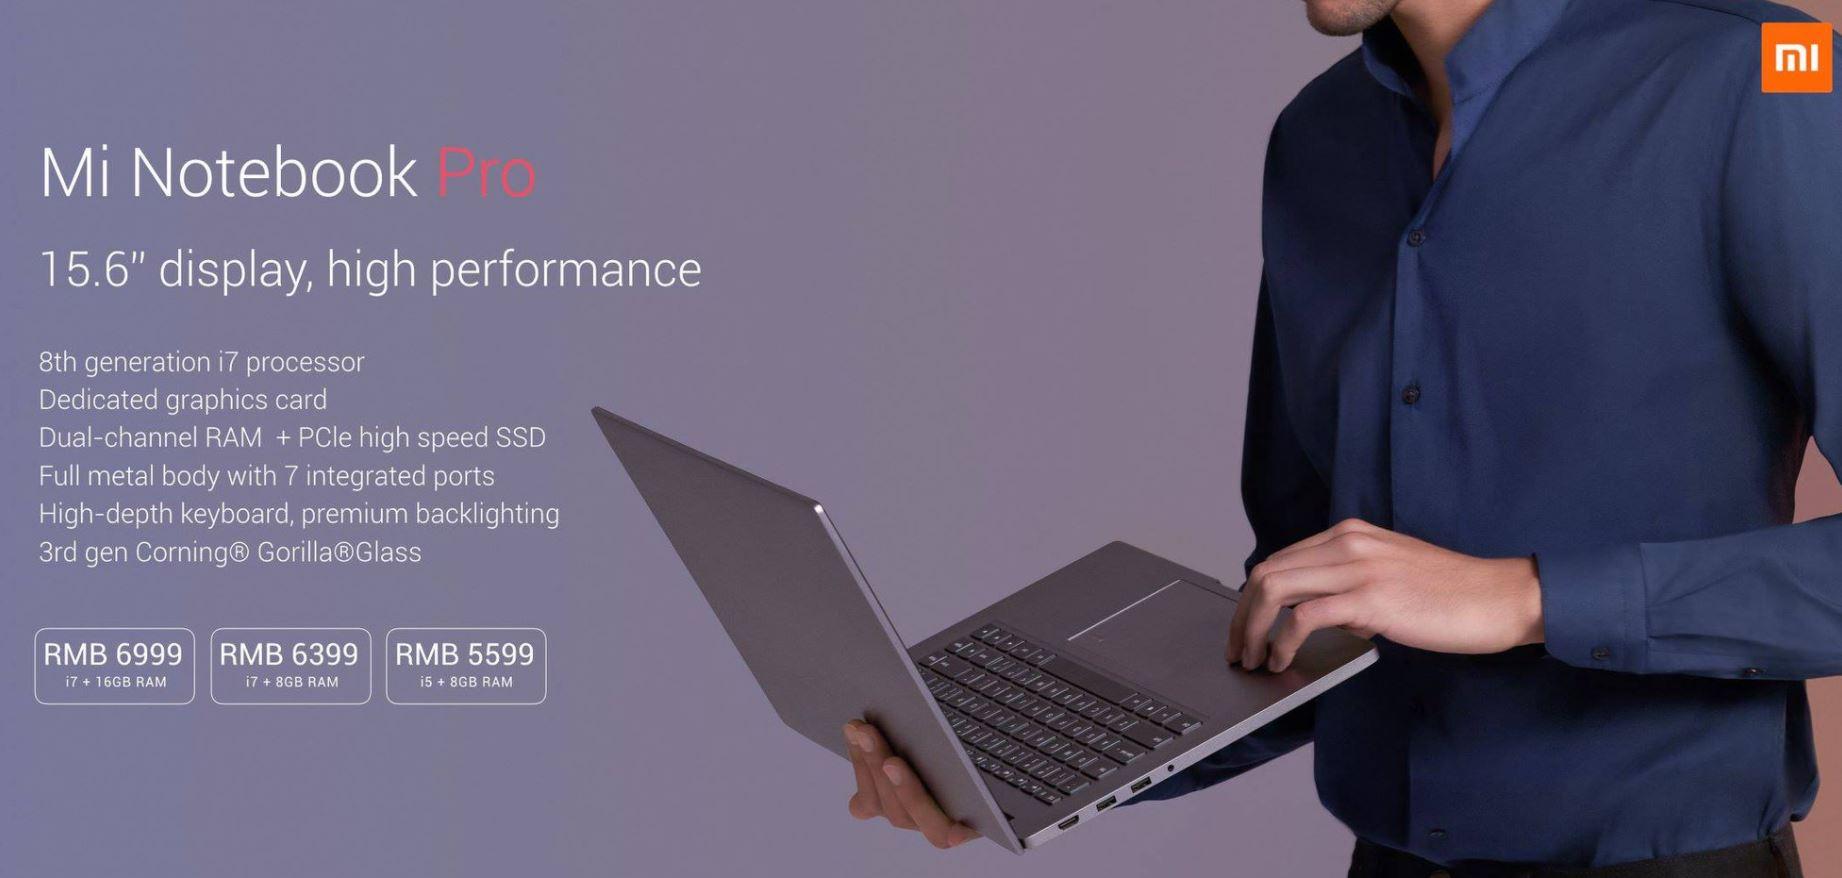 mi-notebook-pro-3